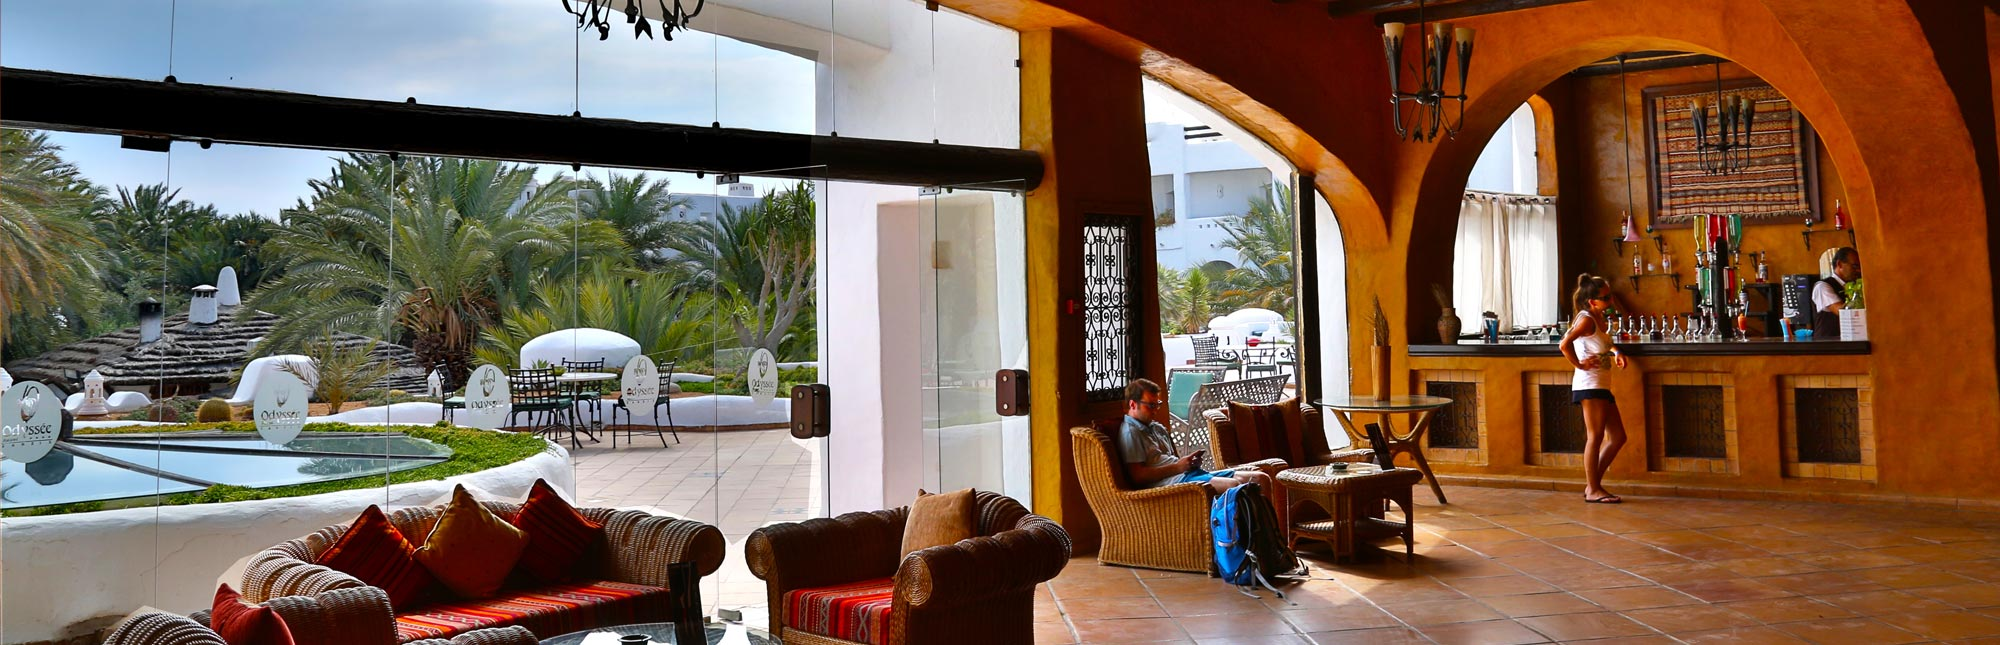 ODYSSEE RESORT Hotel Djerba Zarzis - Home